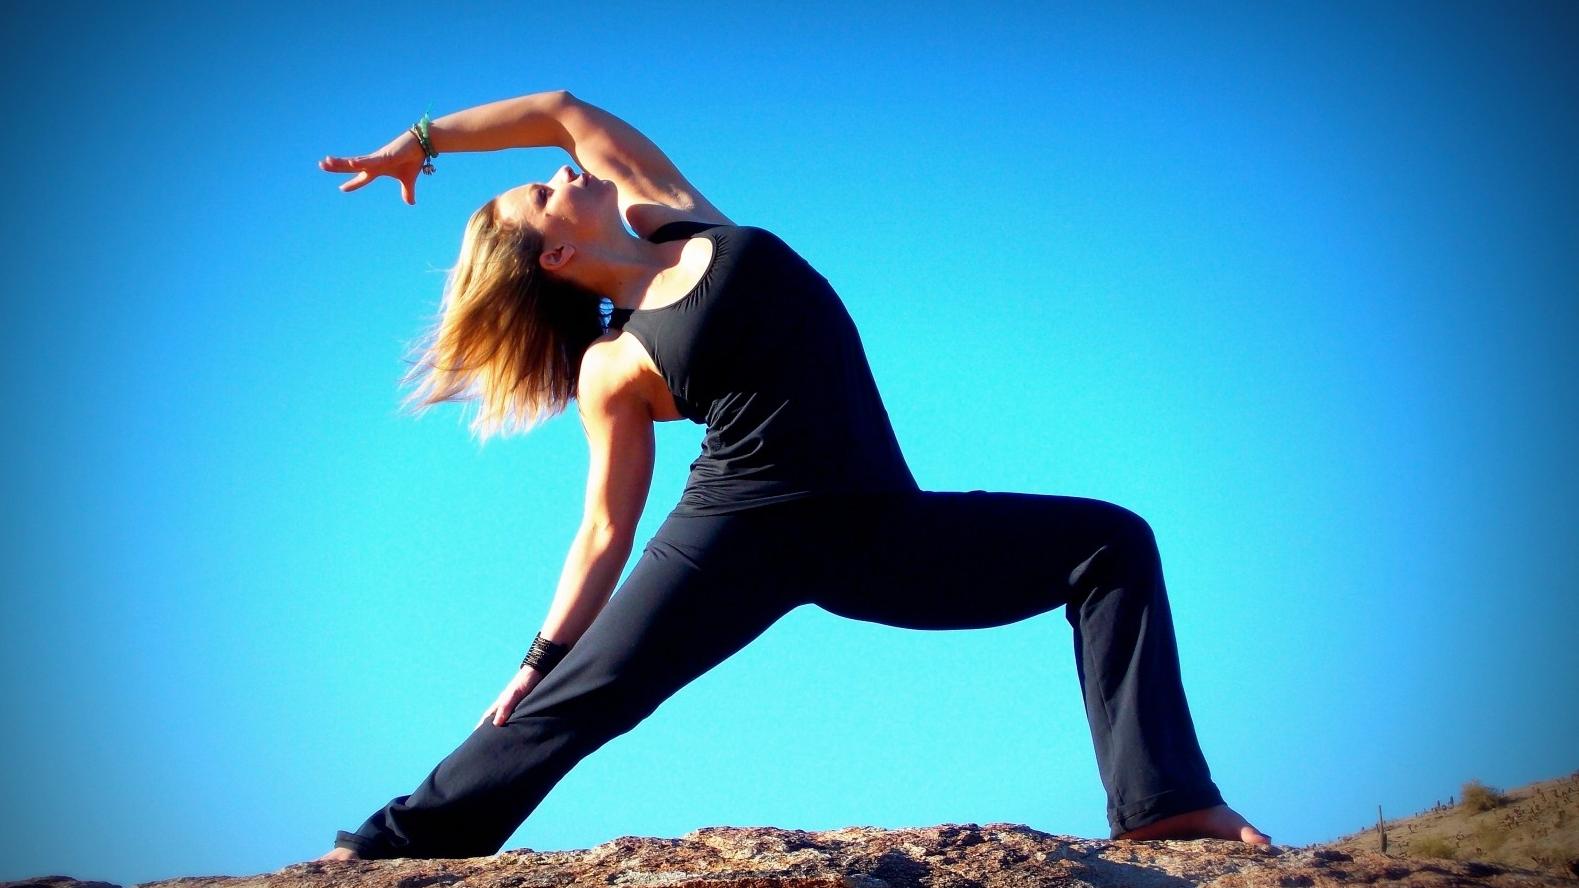 Yoga Burns Serious Kilojoules If You Do It Fast Enough